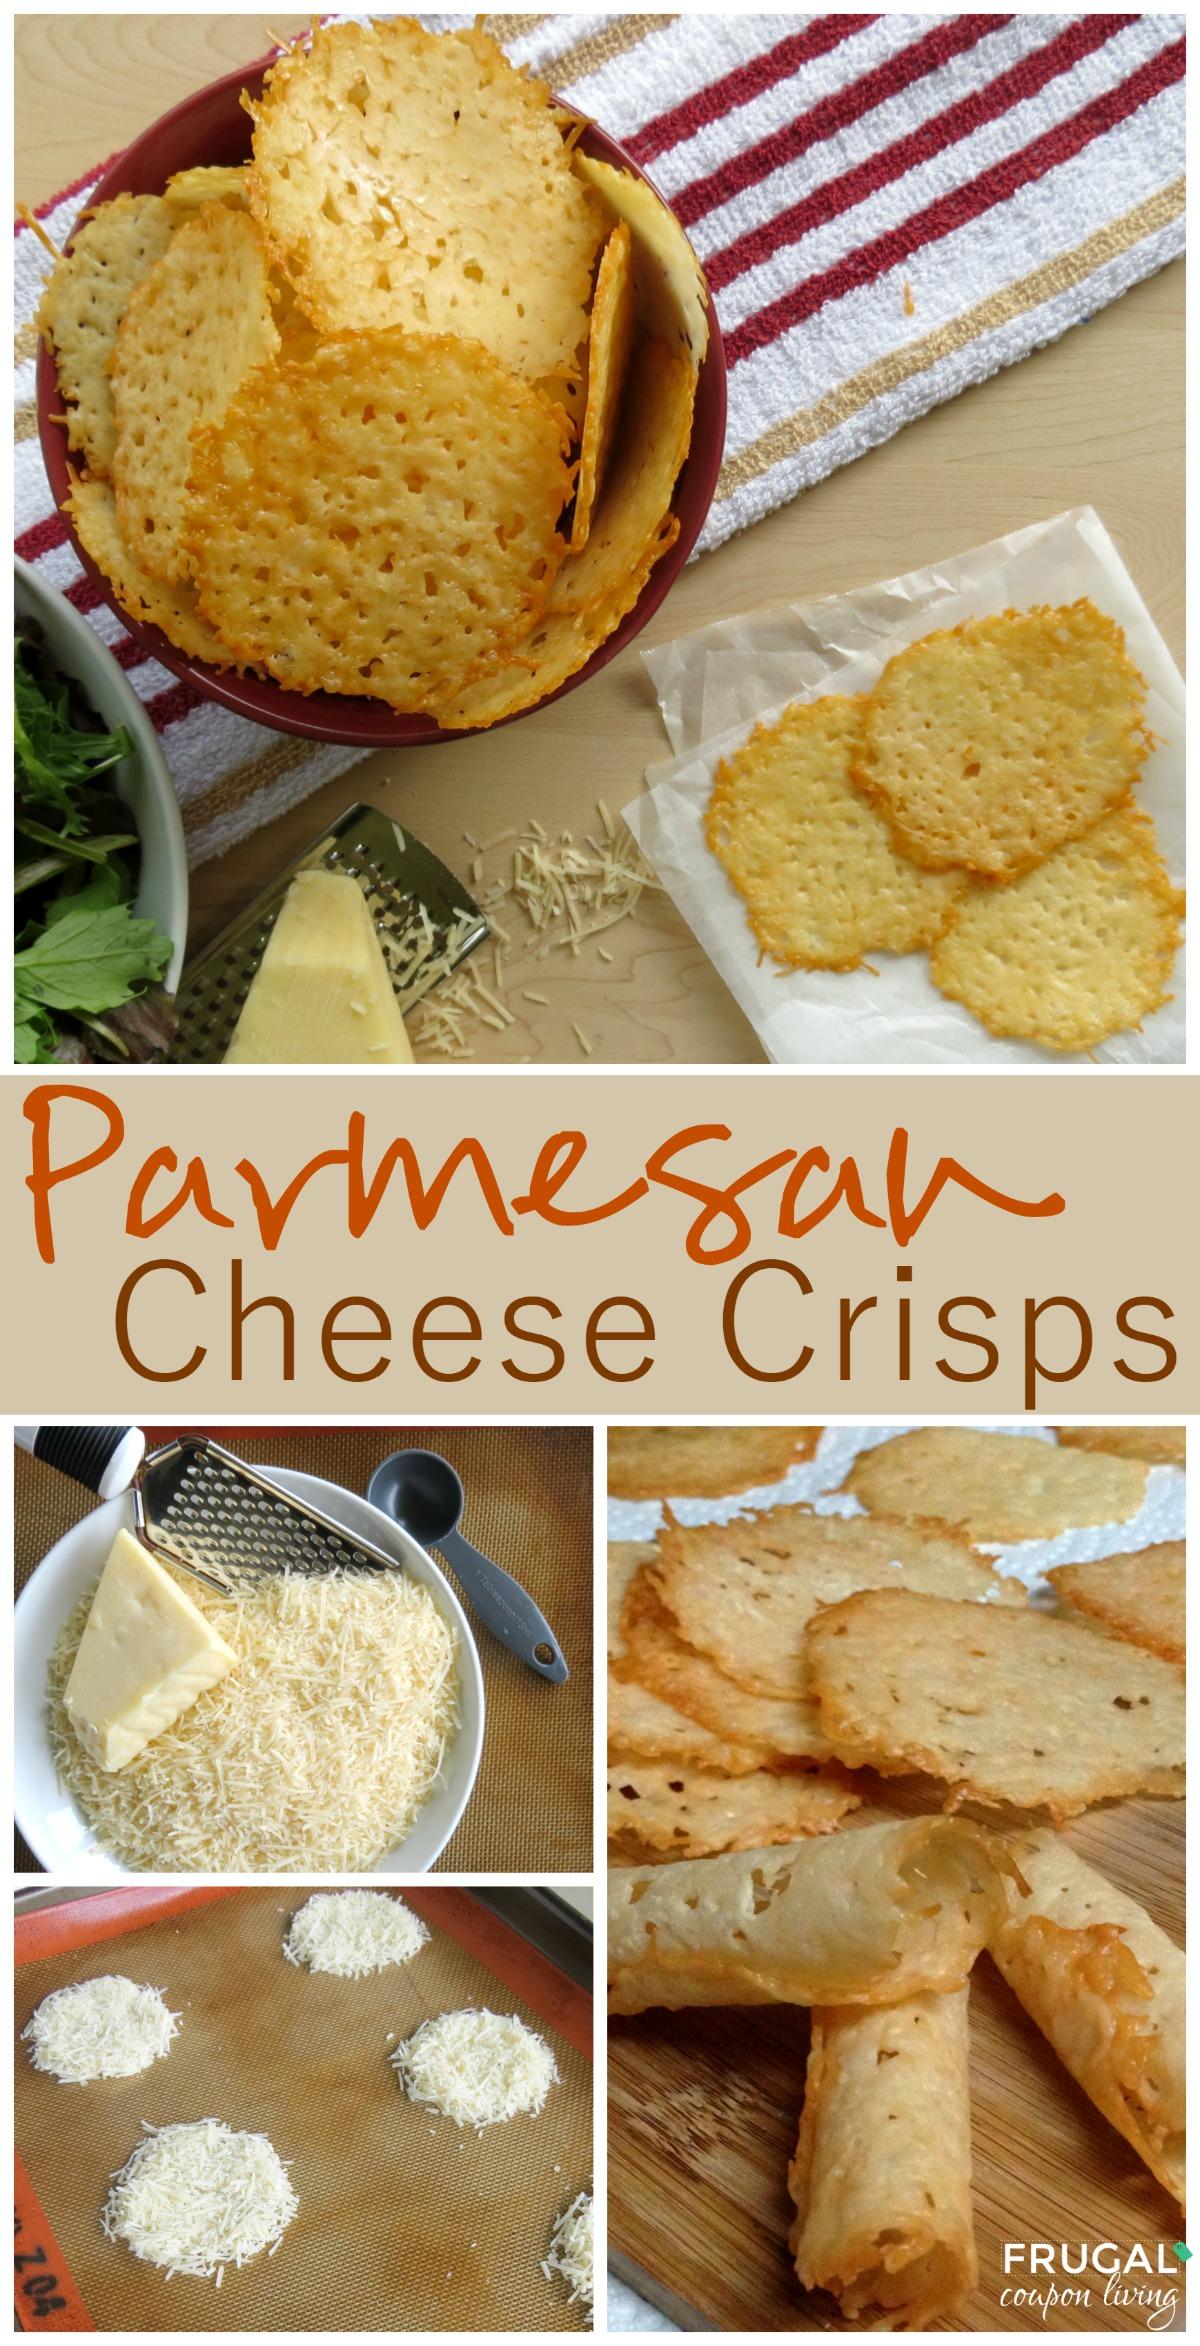 parmesan-cheese-crisps-recipe-frugal-coupon-living